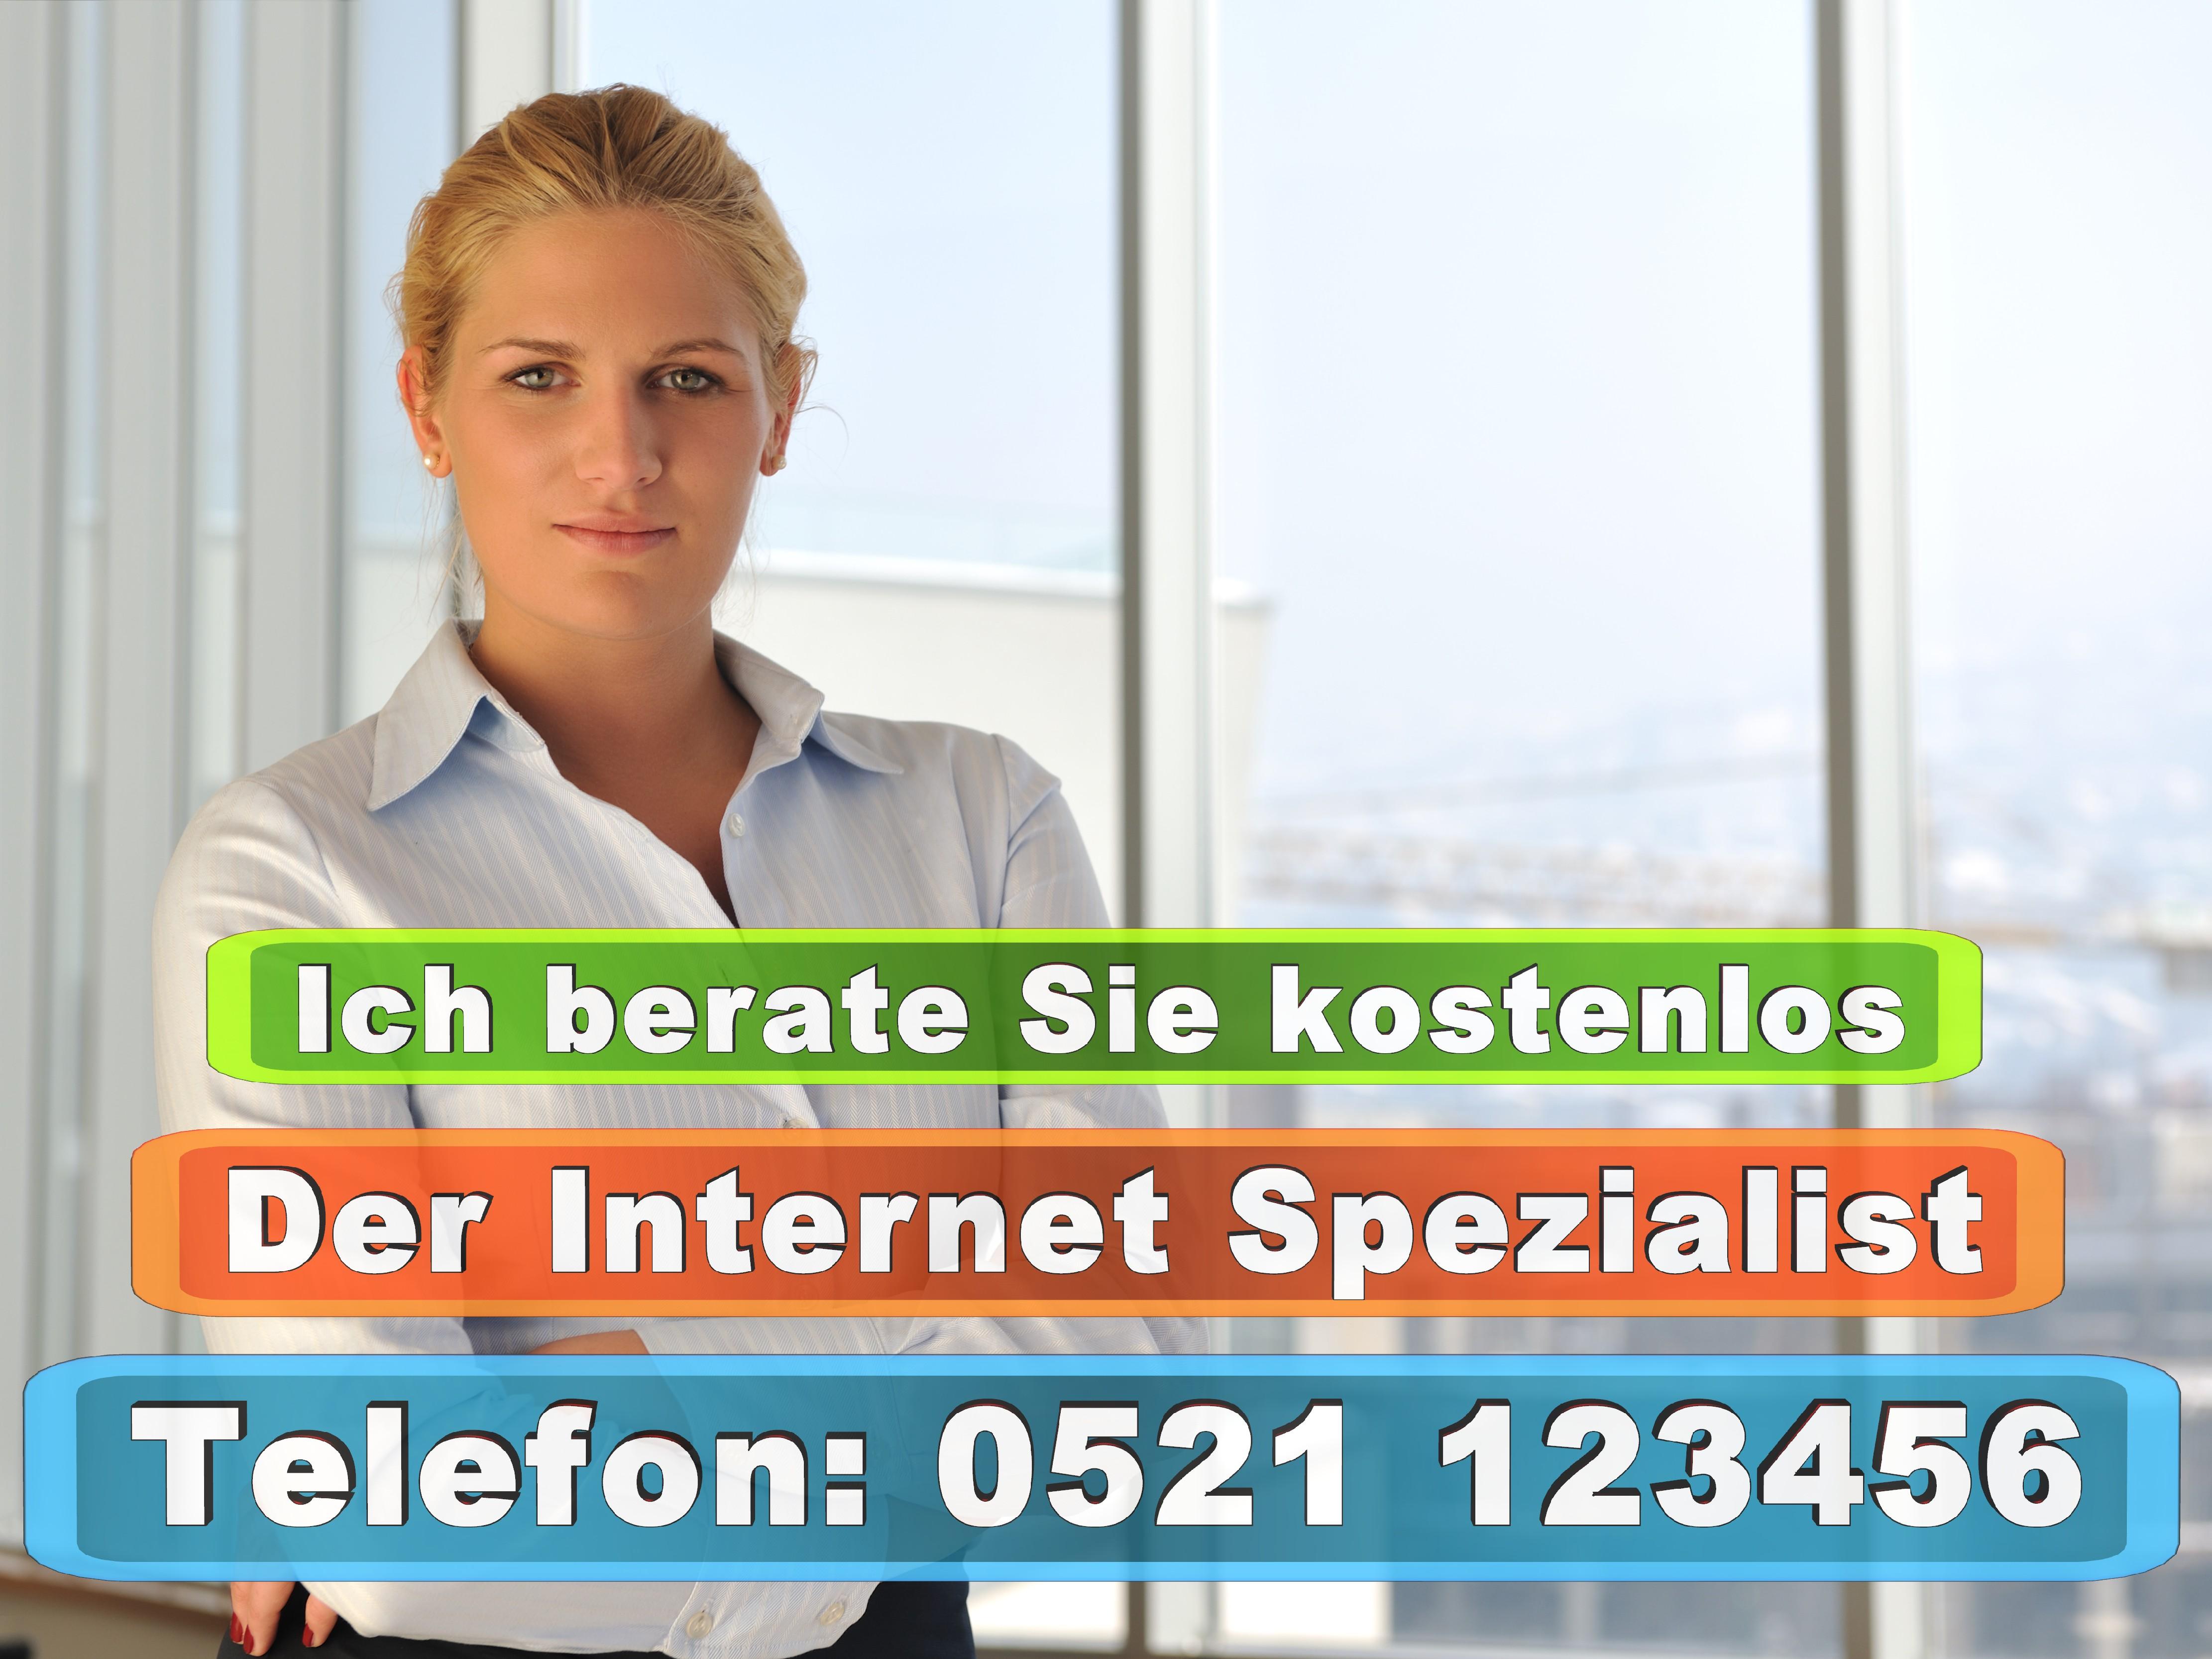 Rechtsanwalt In Bielefeld Steuerberater NRW OWL Paderborn Münster Dortmund Berlin Hamburg Düsseldorf Köln (12)